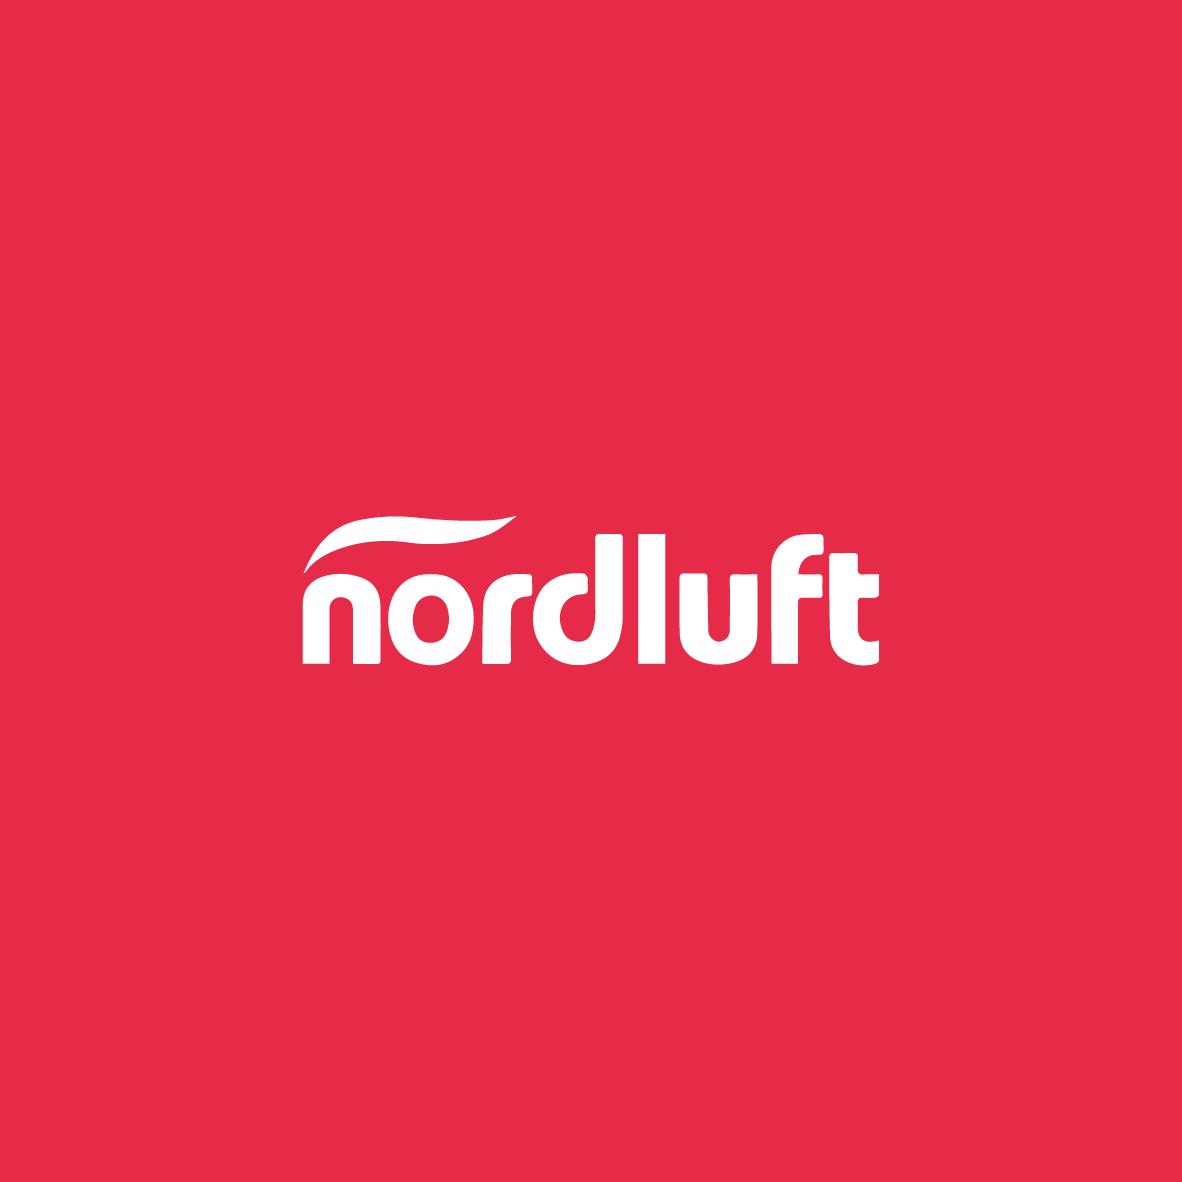 37_NORDLUFT.png